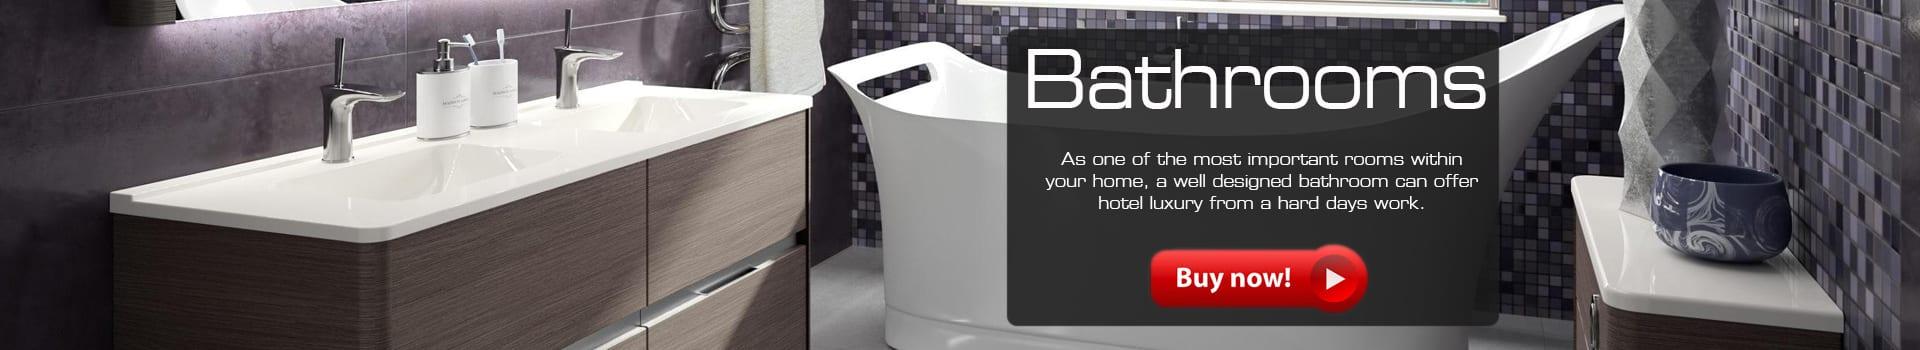 snh bathrooms